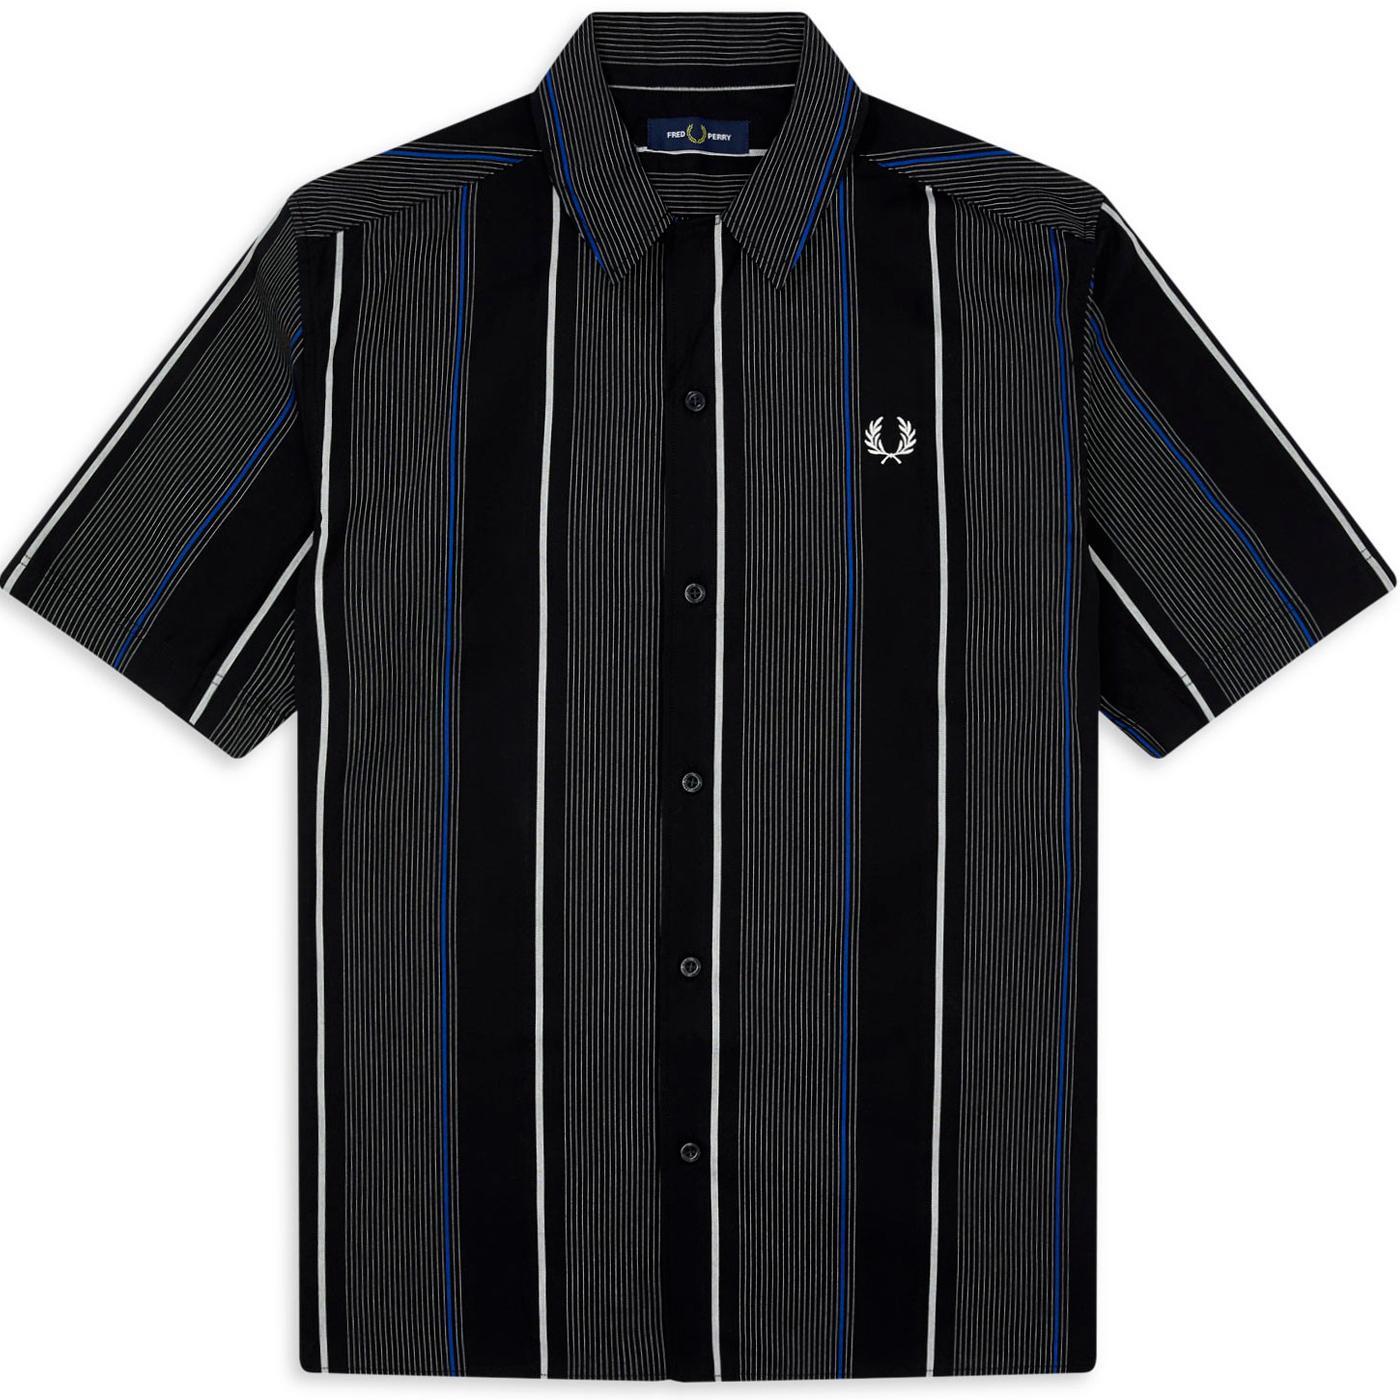 FRED PERRY Retro Stripe Revere Collar Shirt (B)